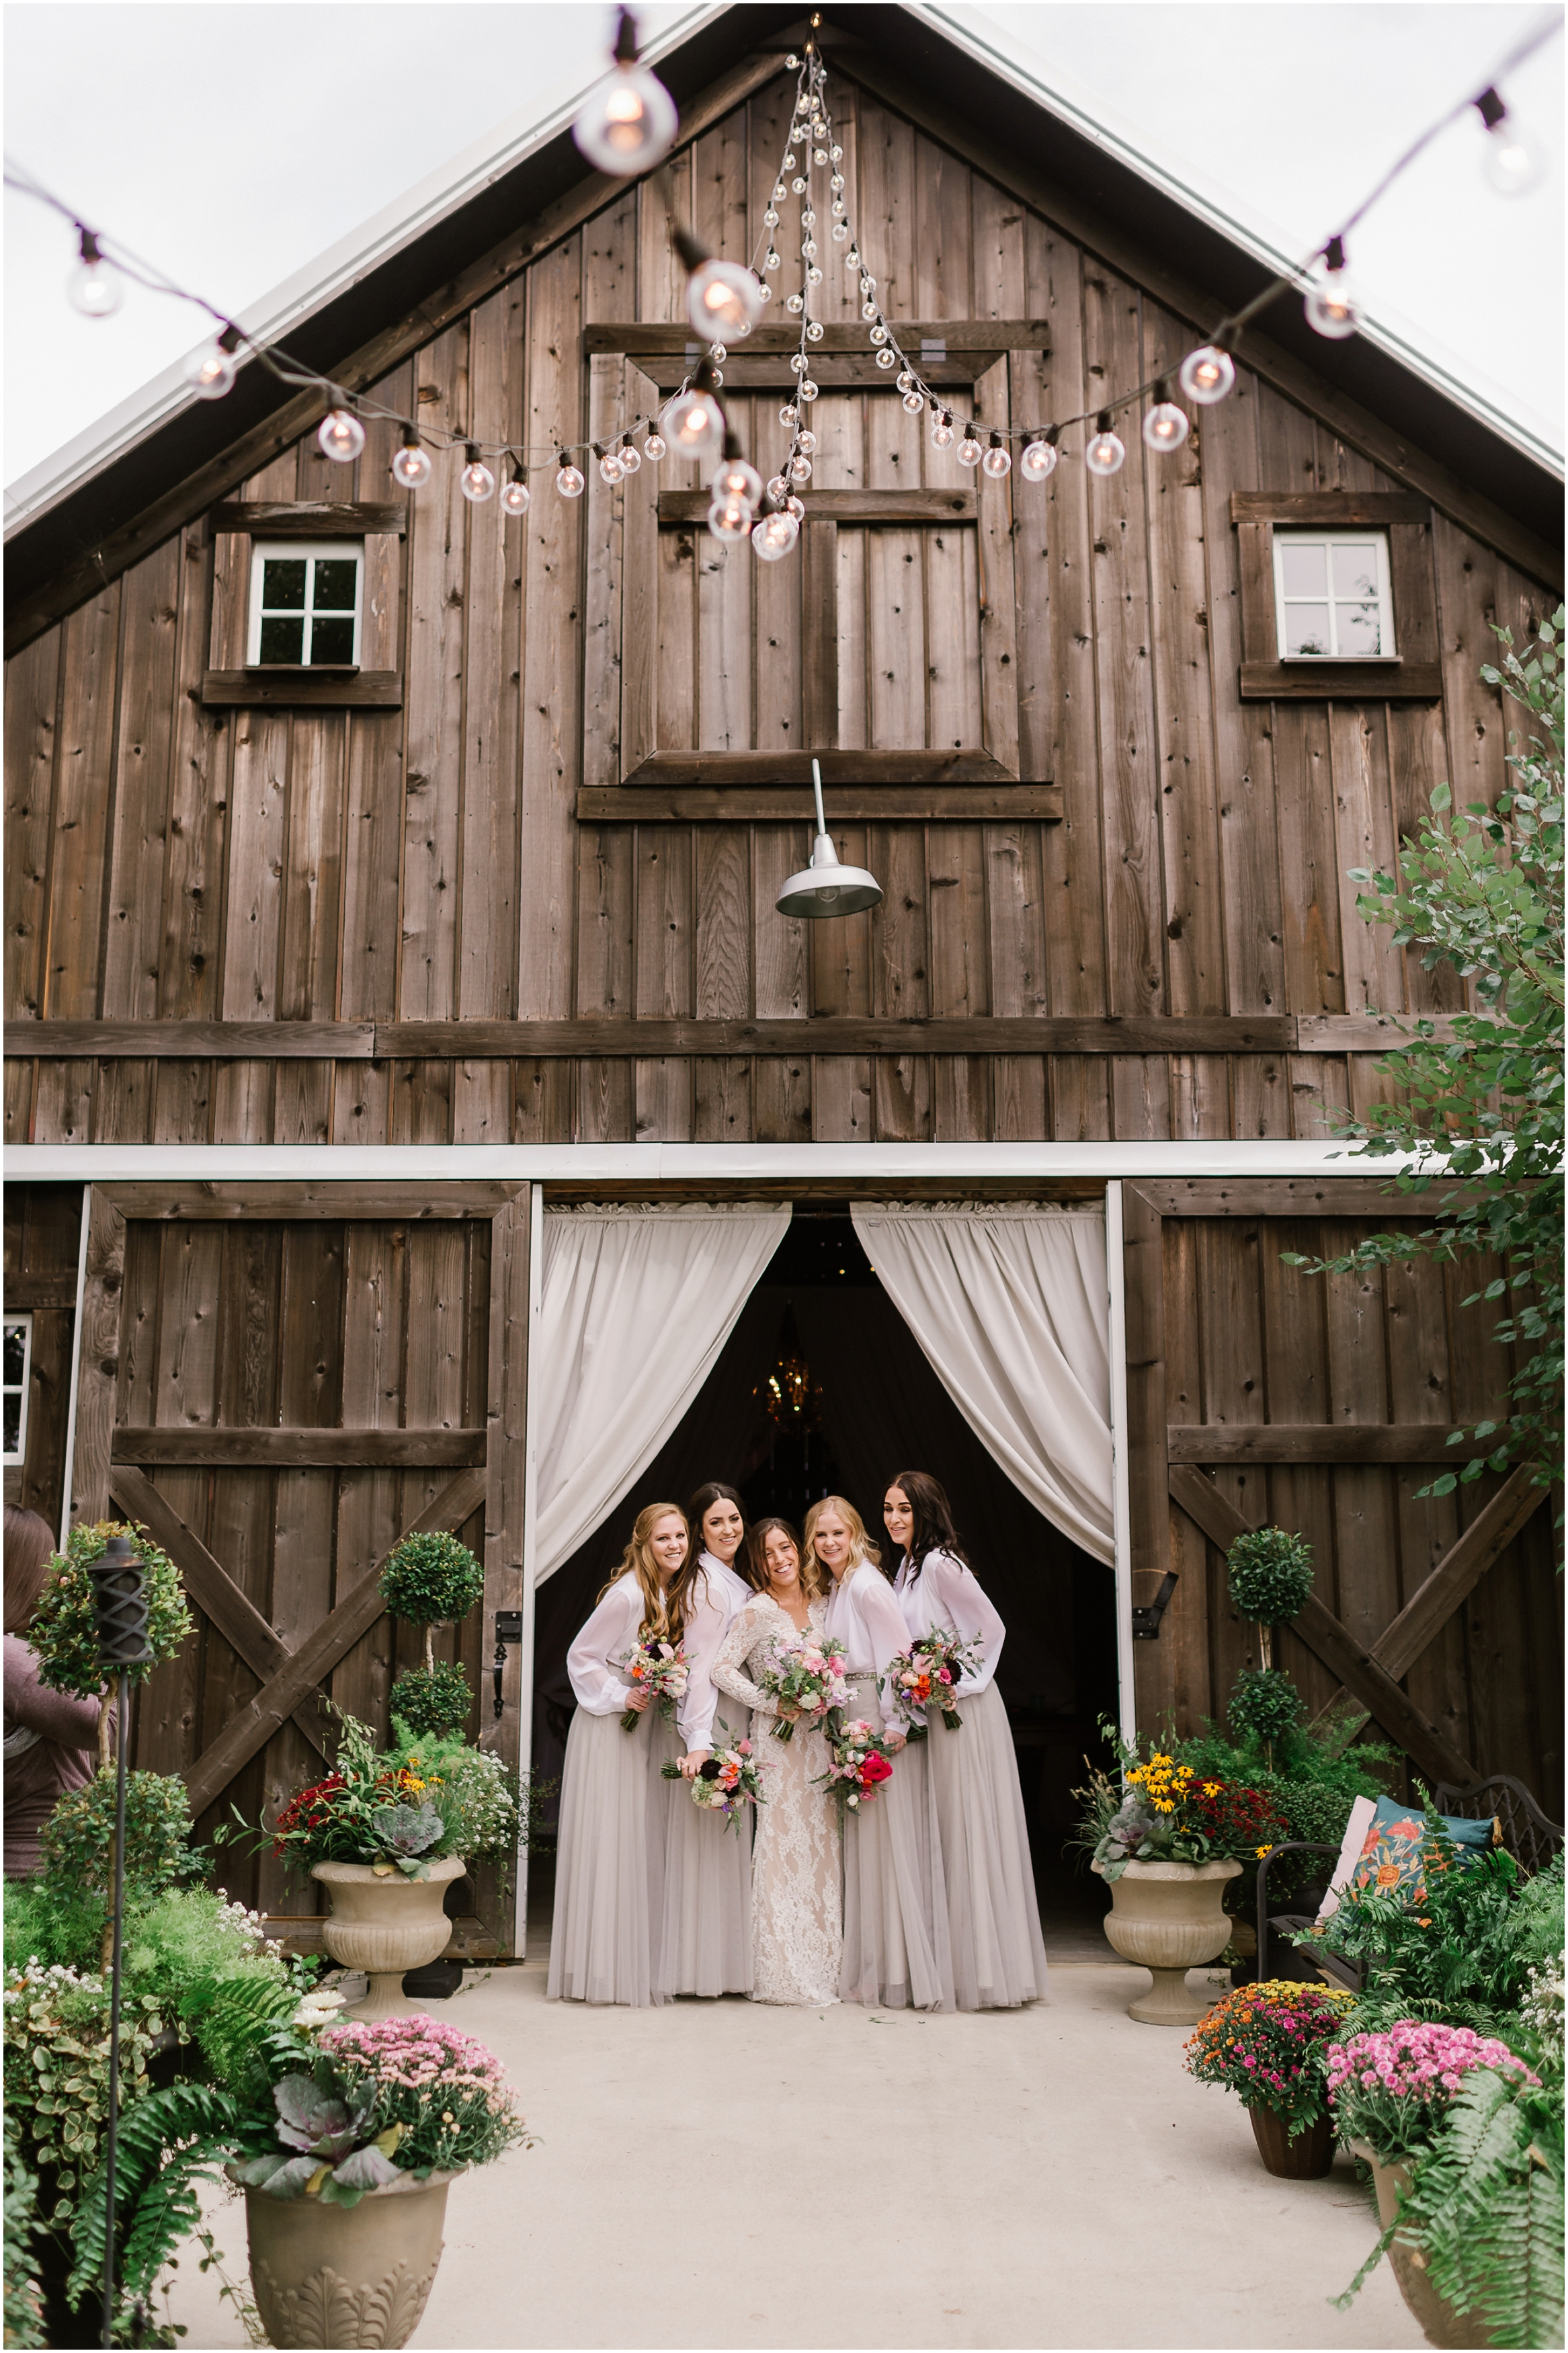 Rebecca_Shehorn_Photography_Indianapolis_Wedding_Photographer_9304.jpg